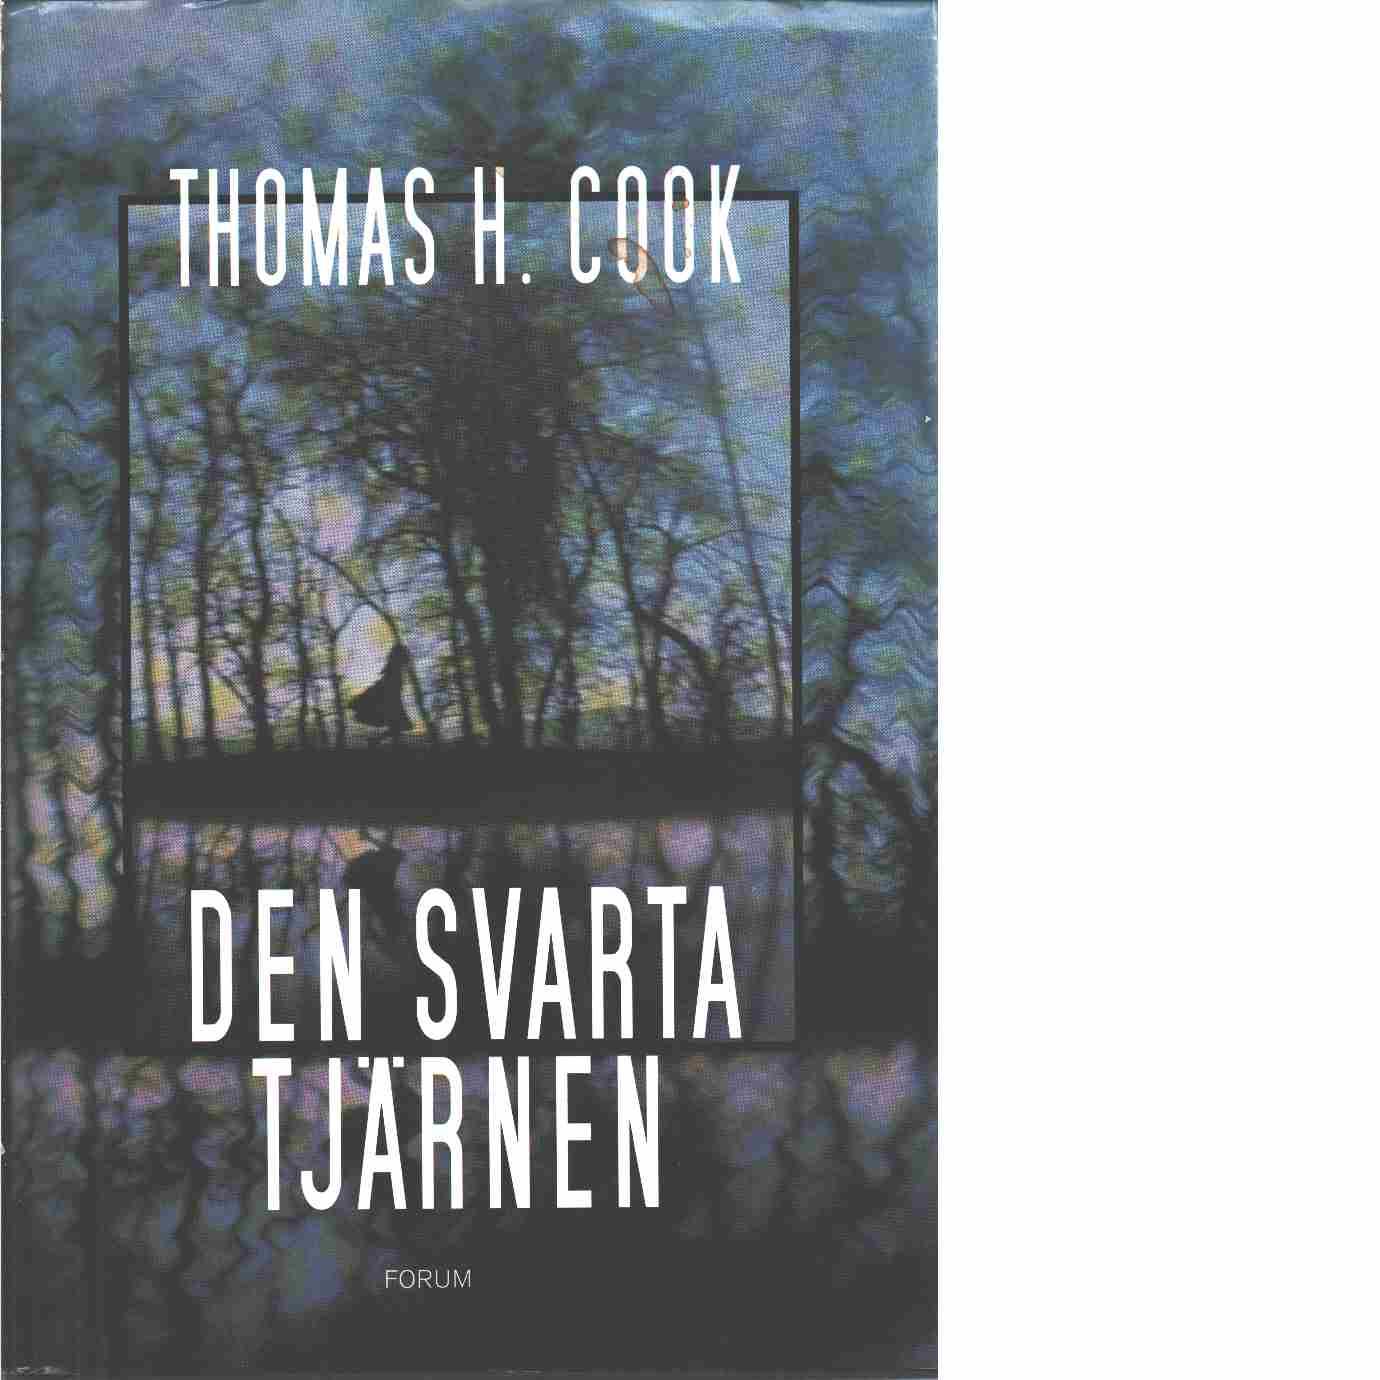 Den svarta tjärnen - Cook, Thomas H.